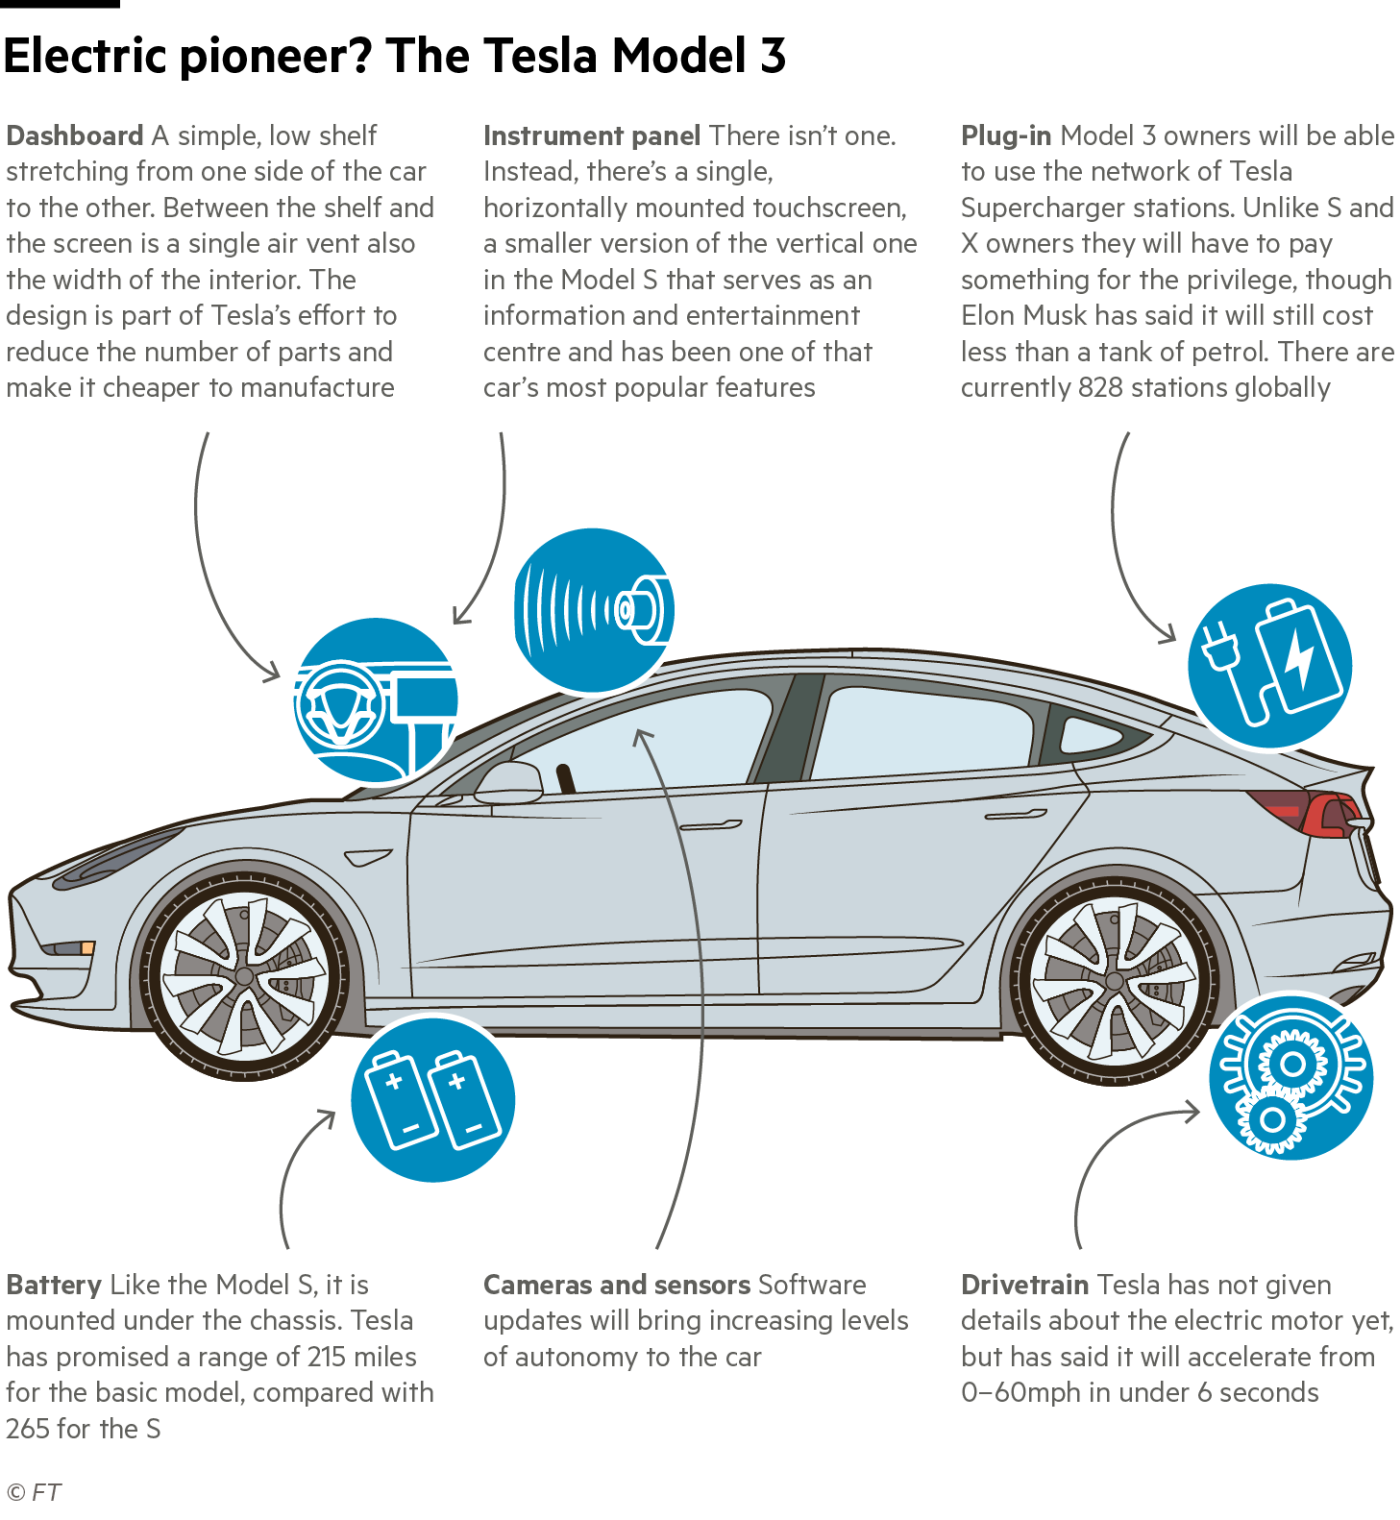 Model 3 上市,特斯拉和 Elon Musk 到了最关键时刻